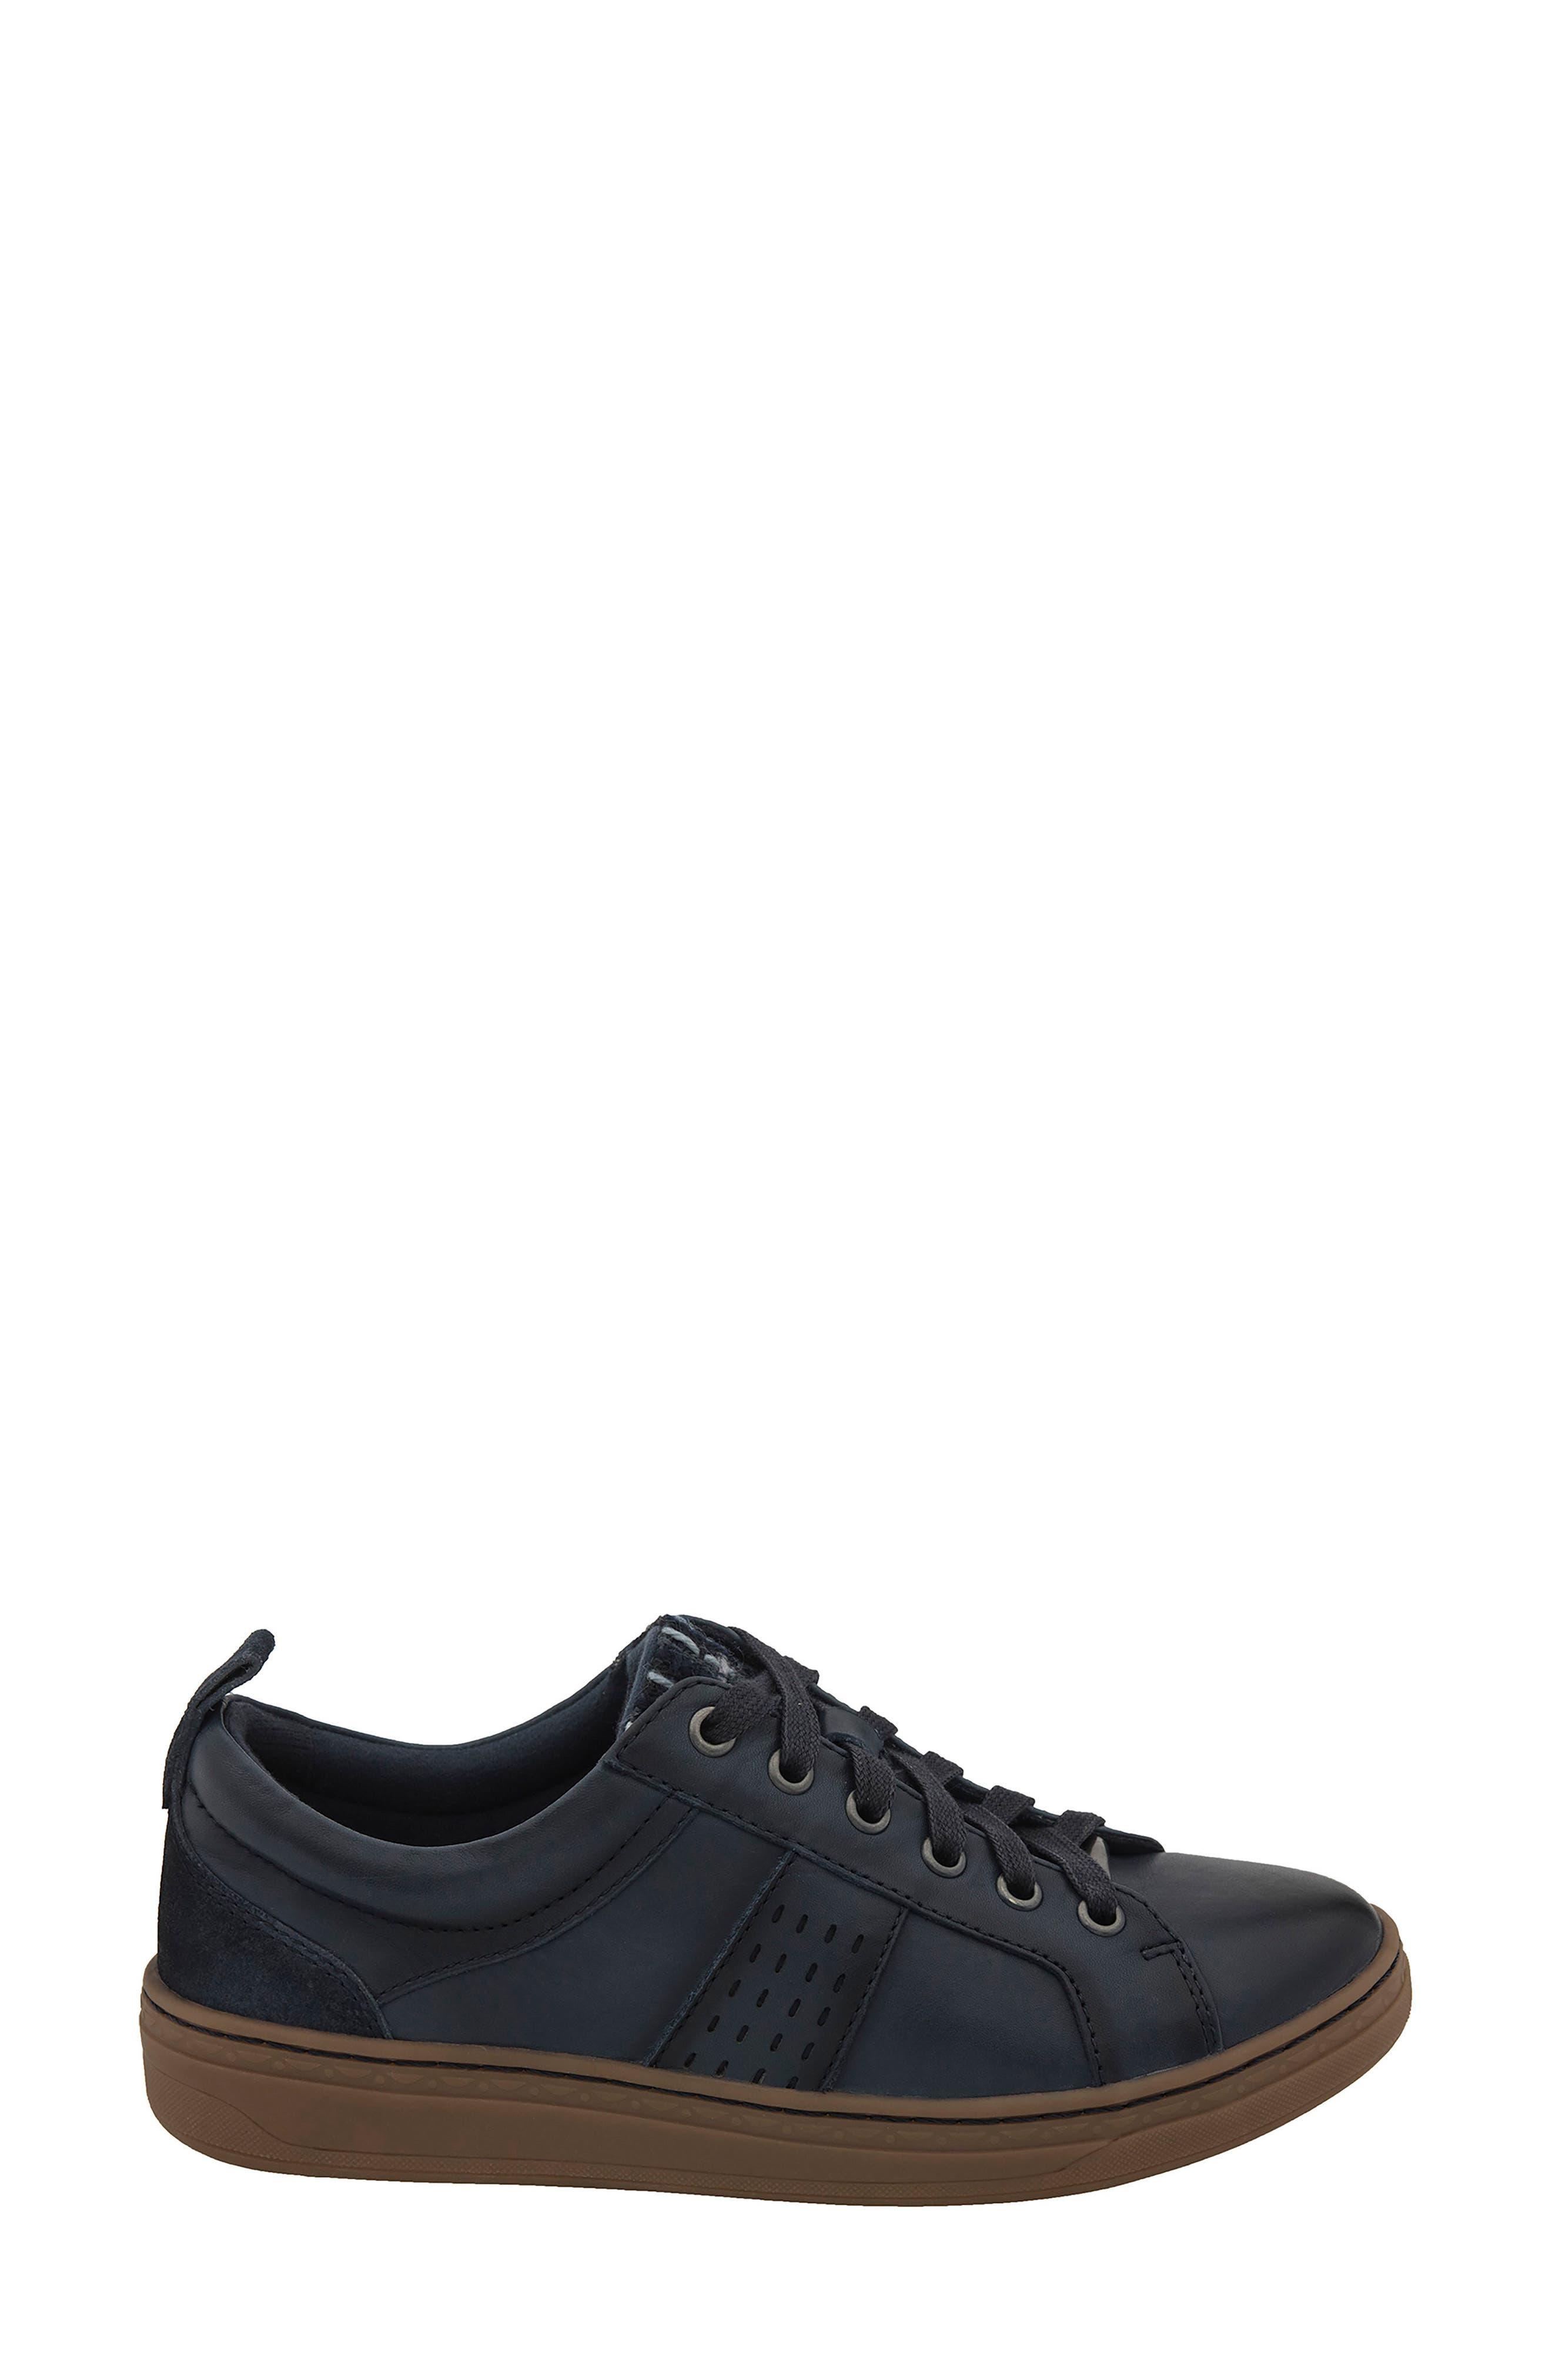 Zag Sneaker,                             Alternate thumbnail 22, color,